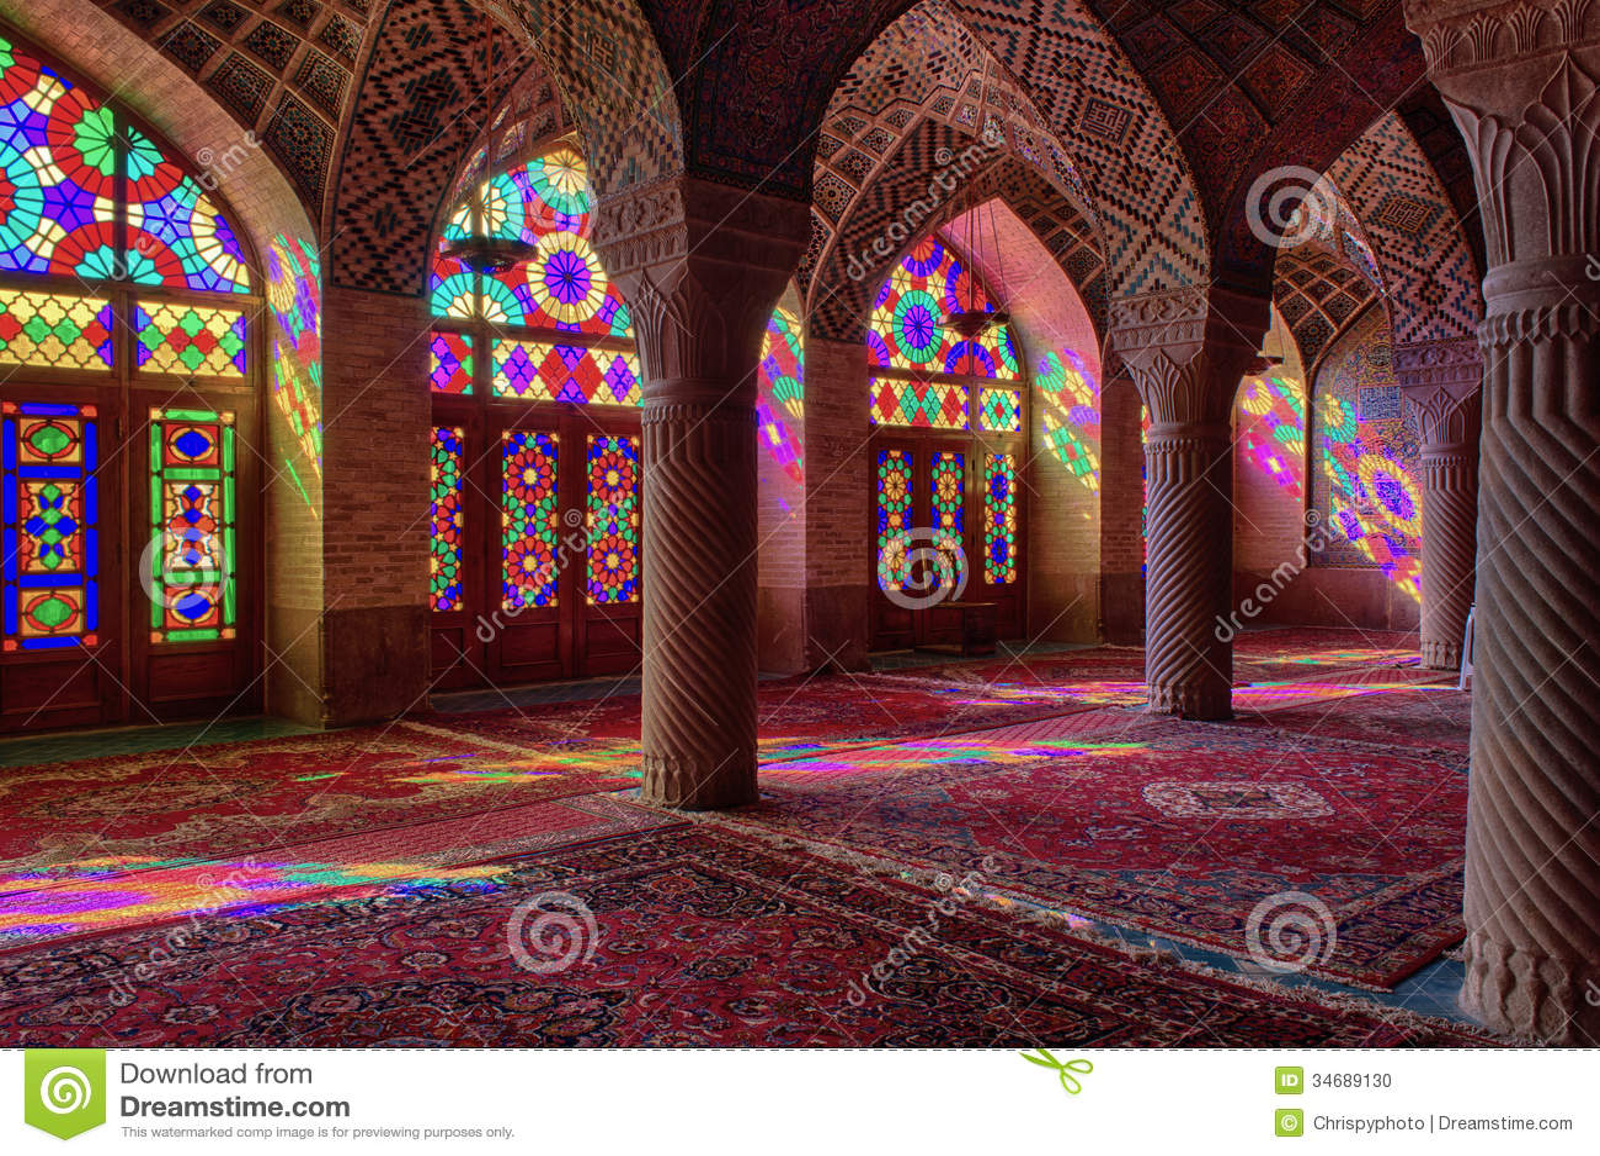 HDR of Nasir al-Mulk Mosque in Shiraz, Iran